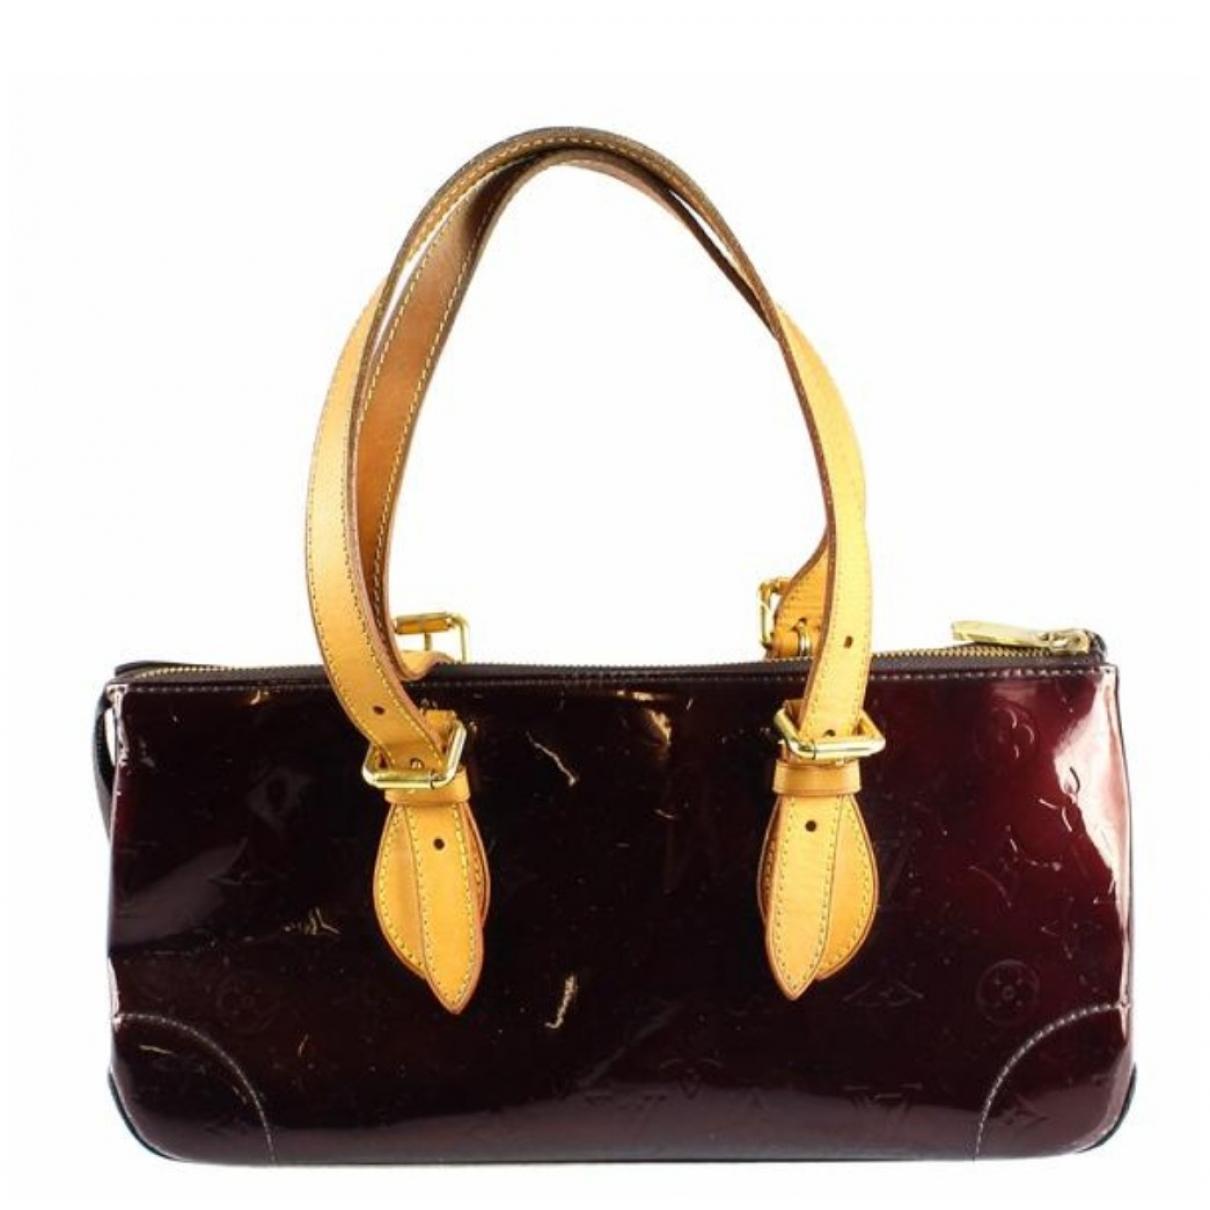 a6086add5 Louis Vuitton. Women's Rosemood Purple Leather Handbag. £662 From Vestiaire  Collective